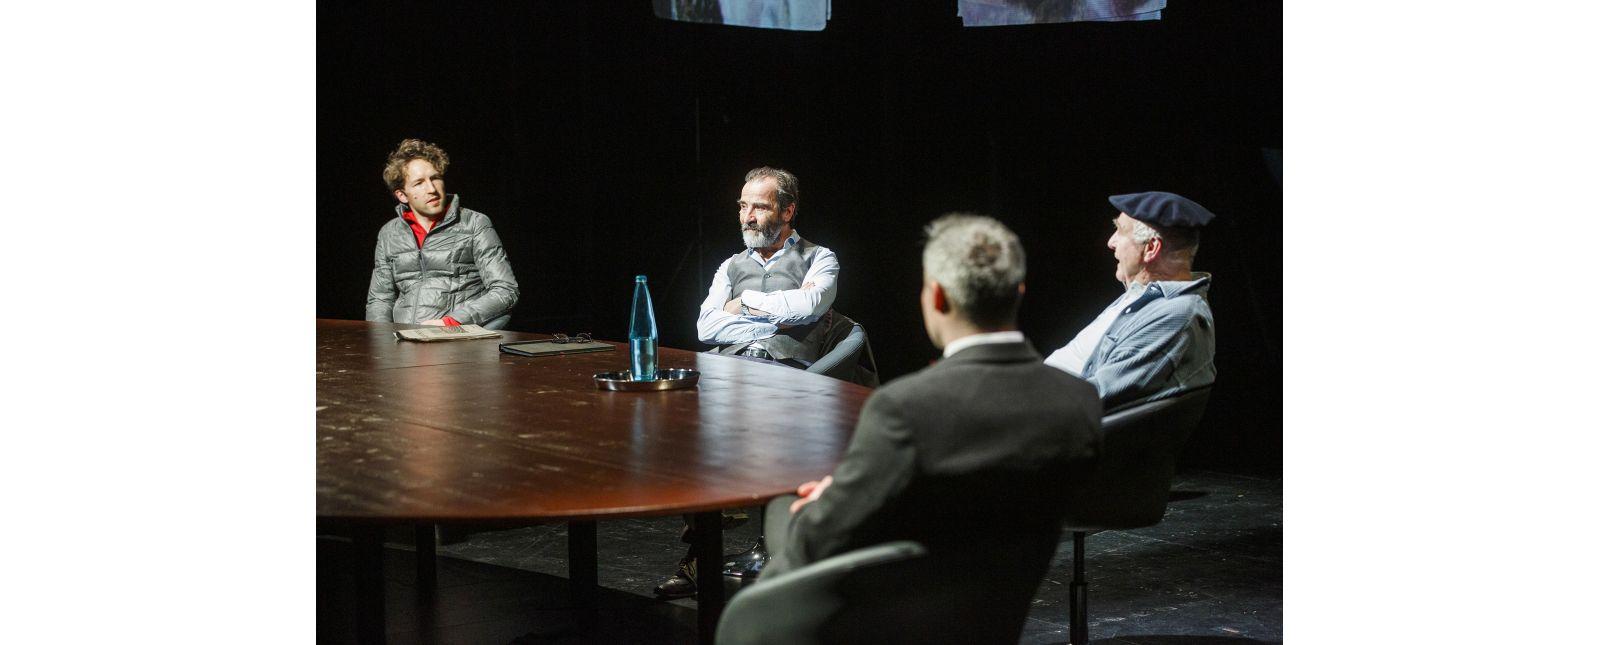 Die Seuche // Moritz Peschke / Henry Meyer / Hartmut Stanke / Tim Al-Windawe // Foto: Rainer Muranyi